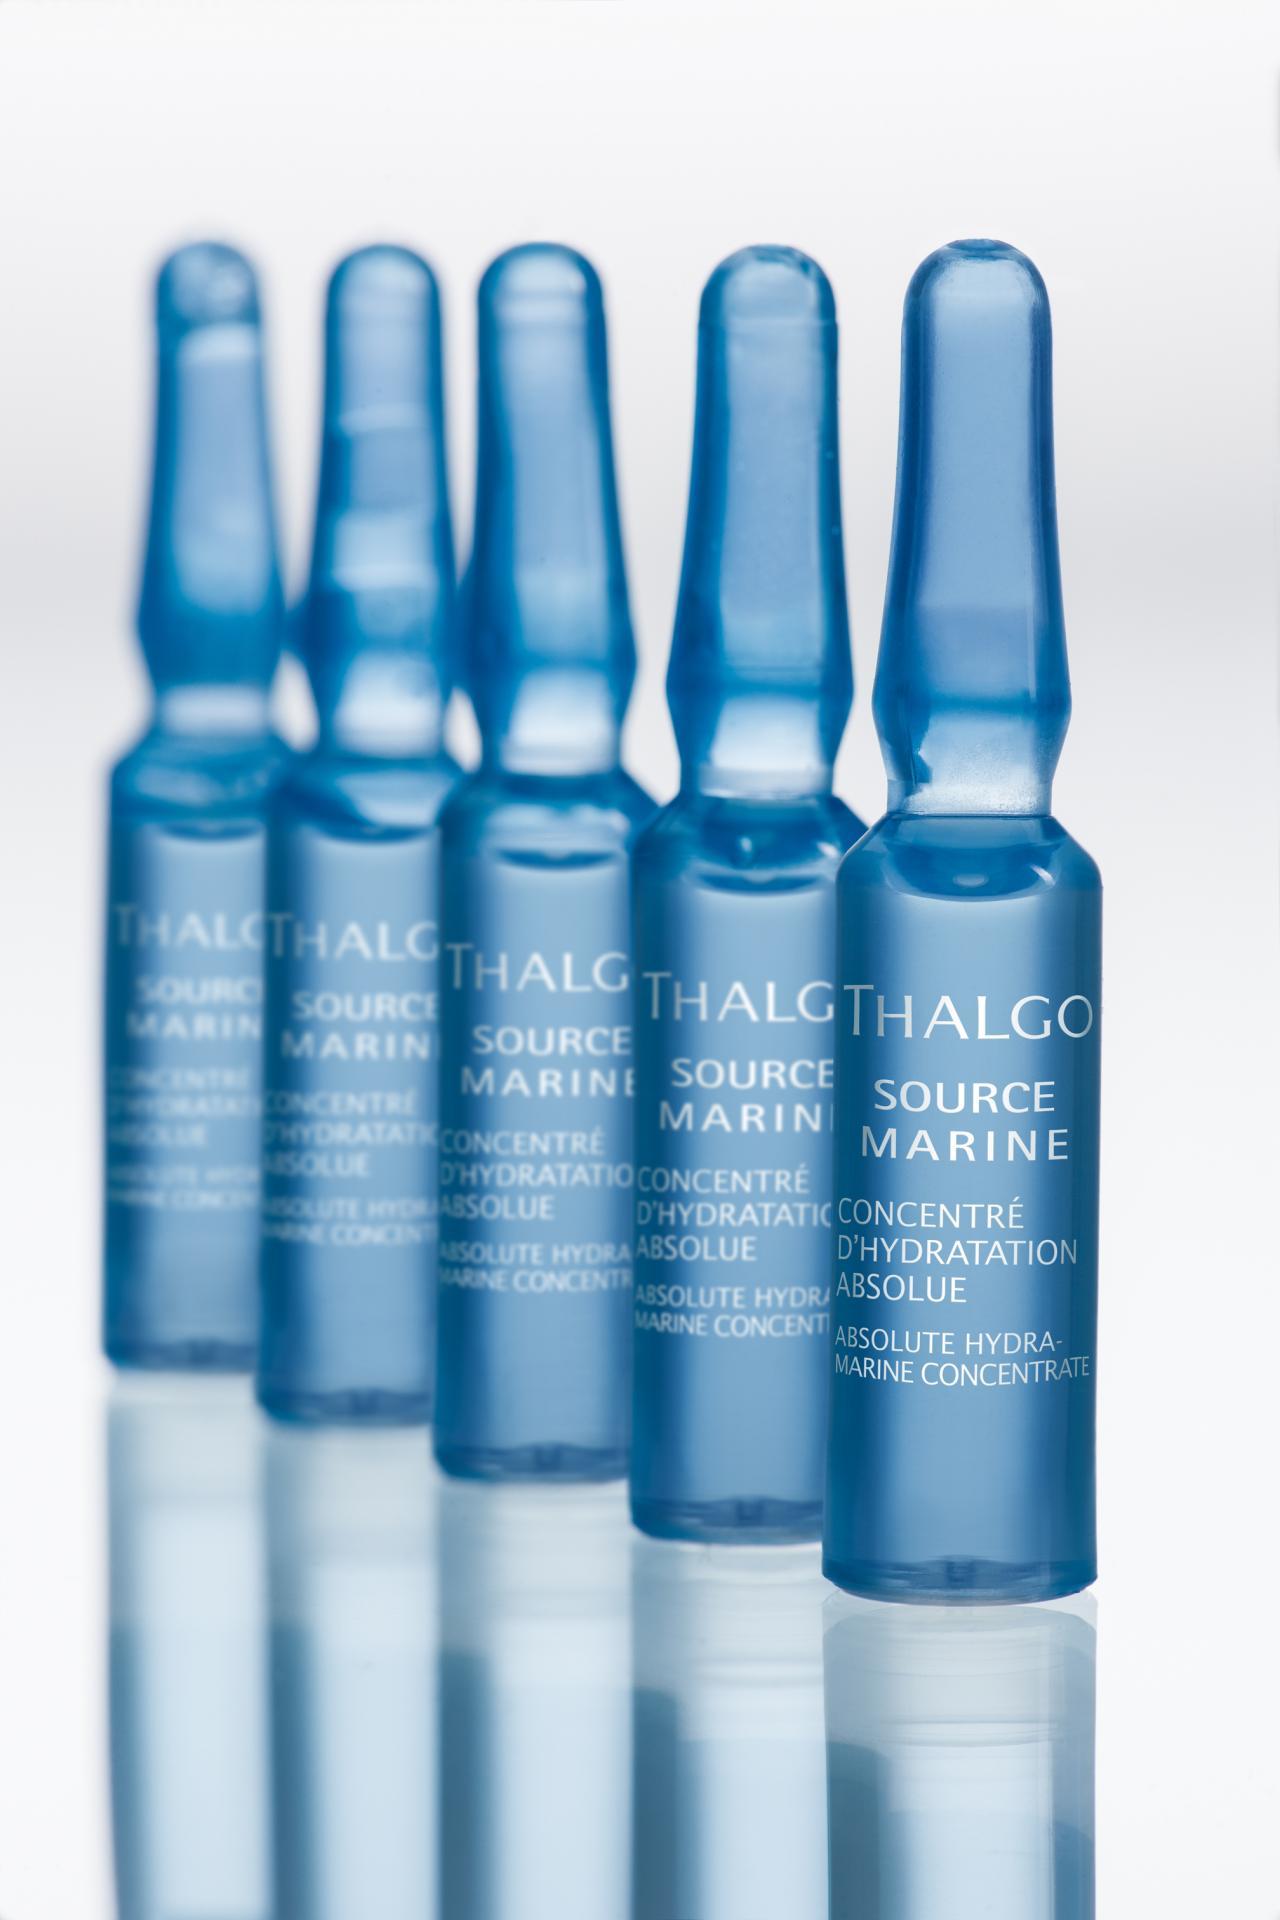 Concentre d hydratation absolu